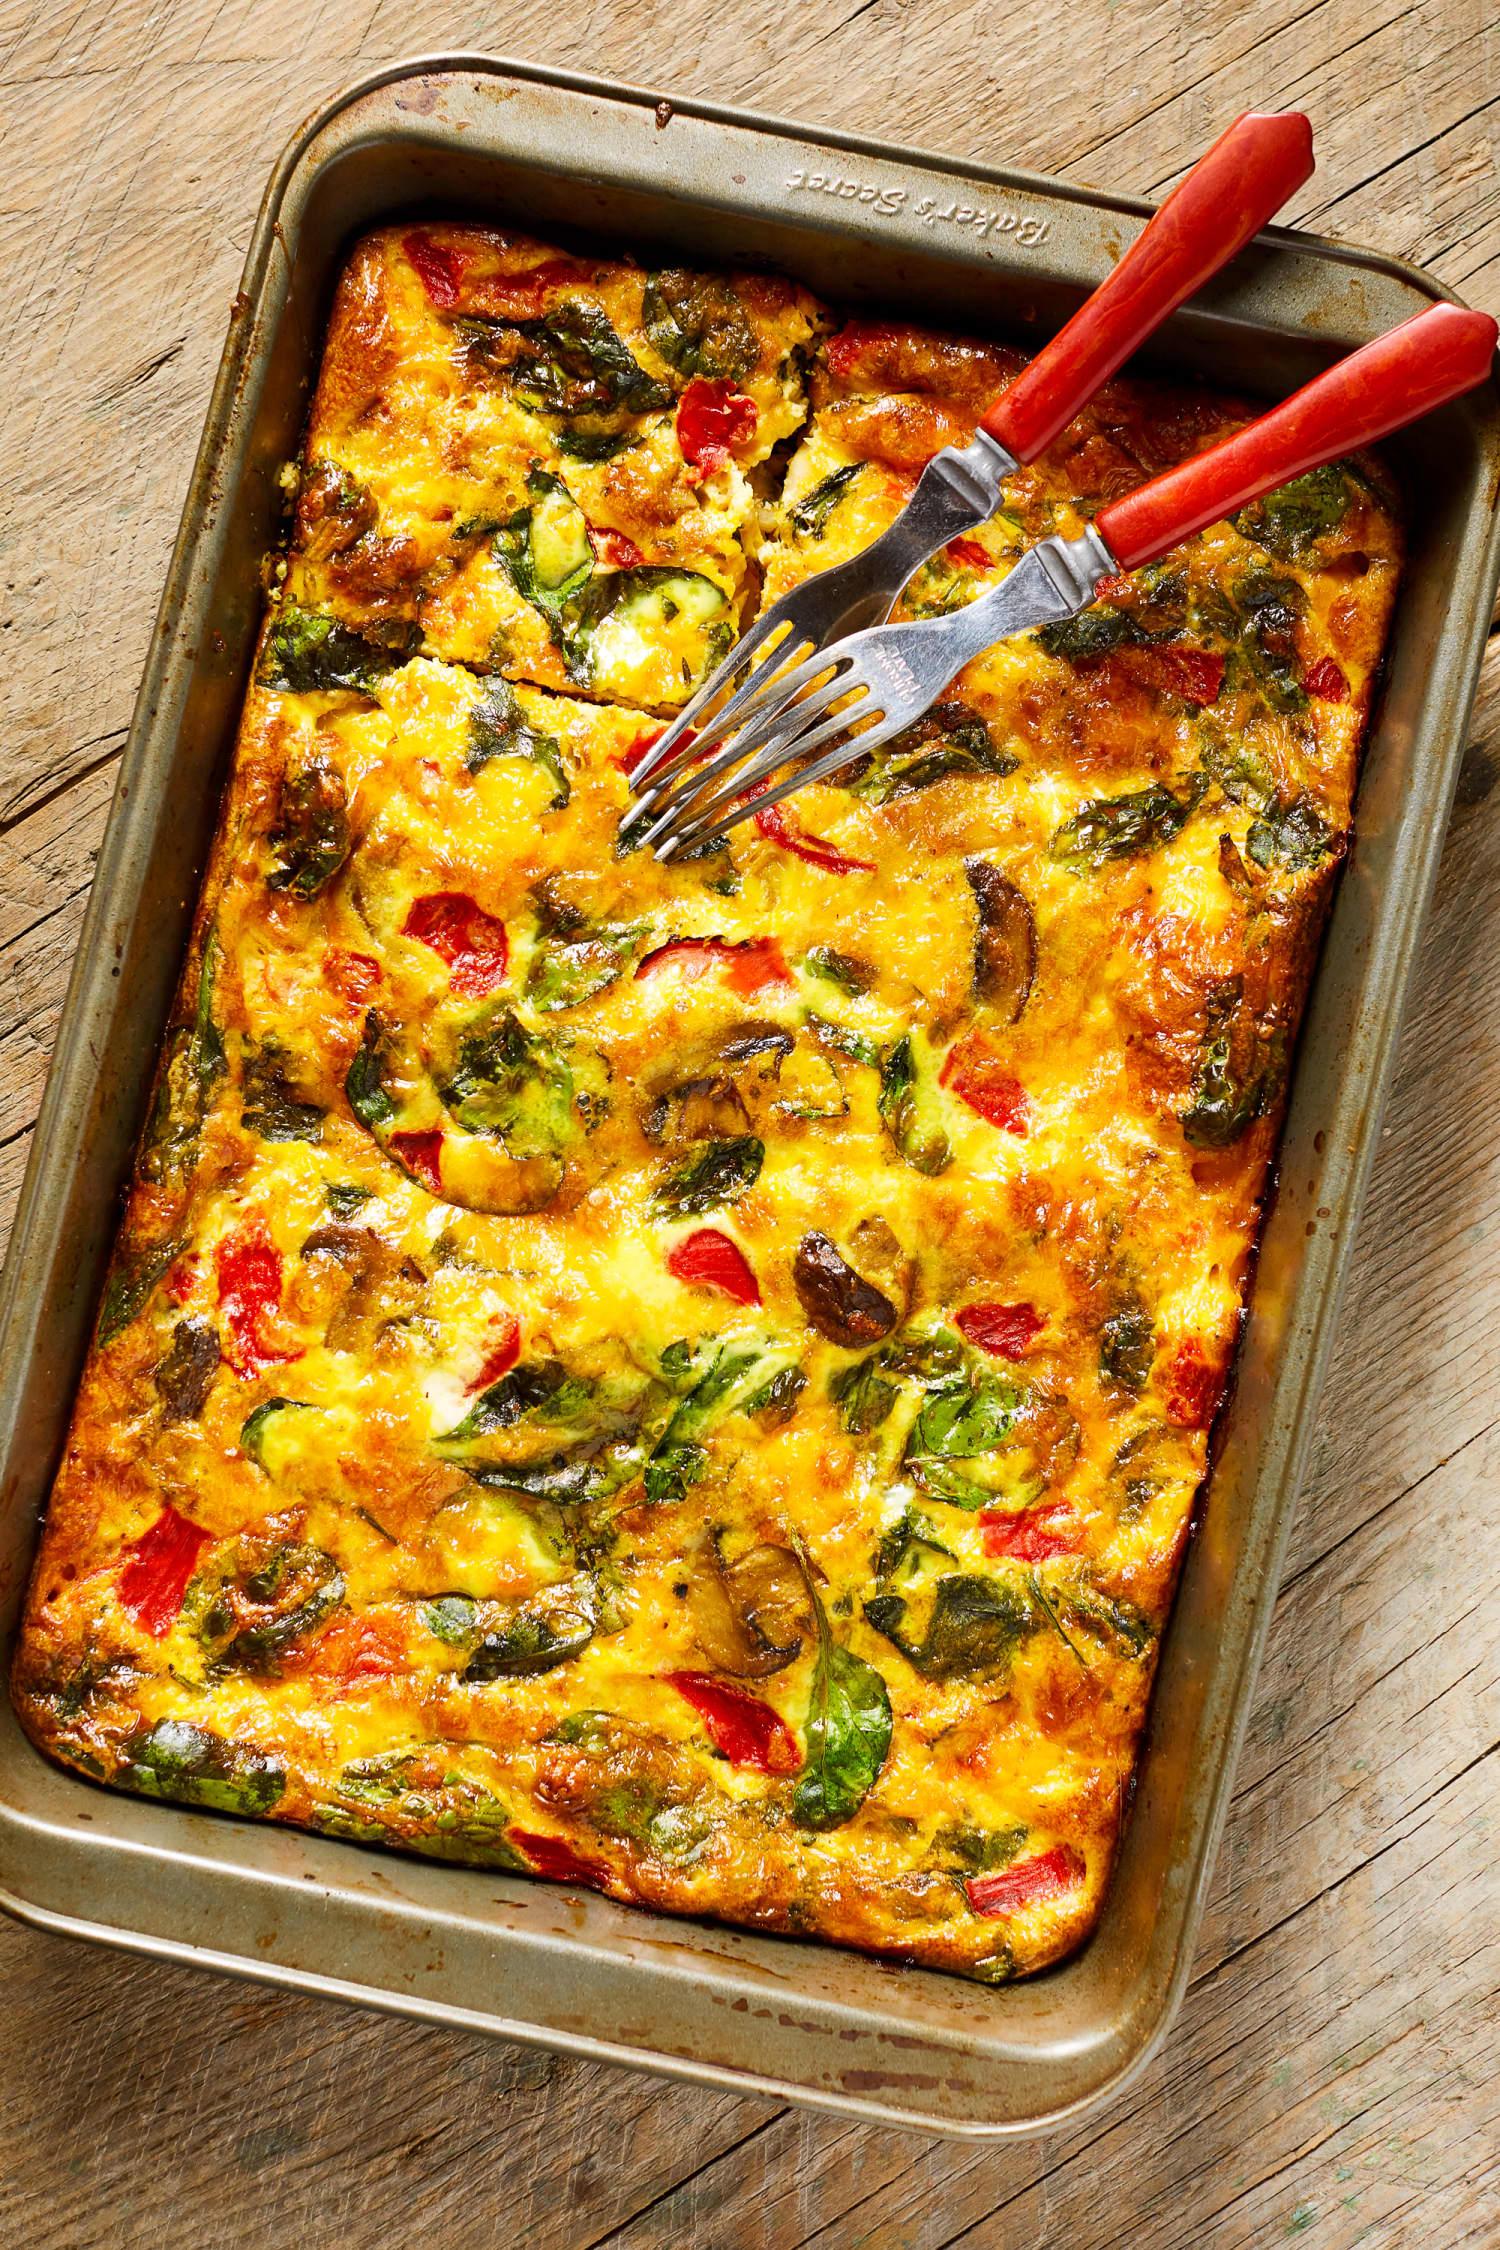 Vegetable Supreme Egg Bake Is For The Vegetable Lovers